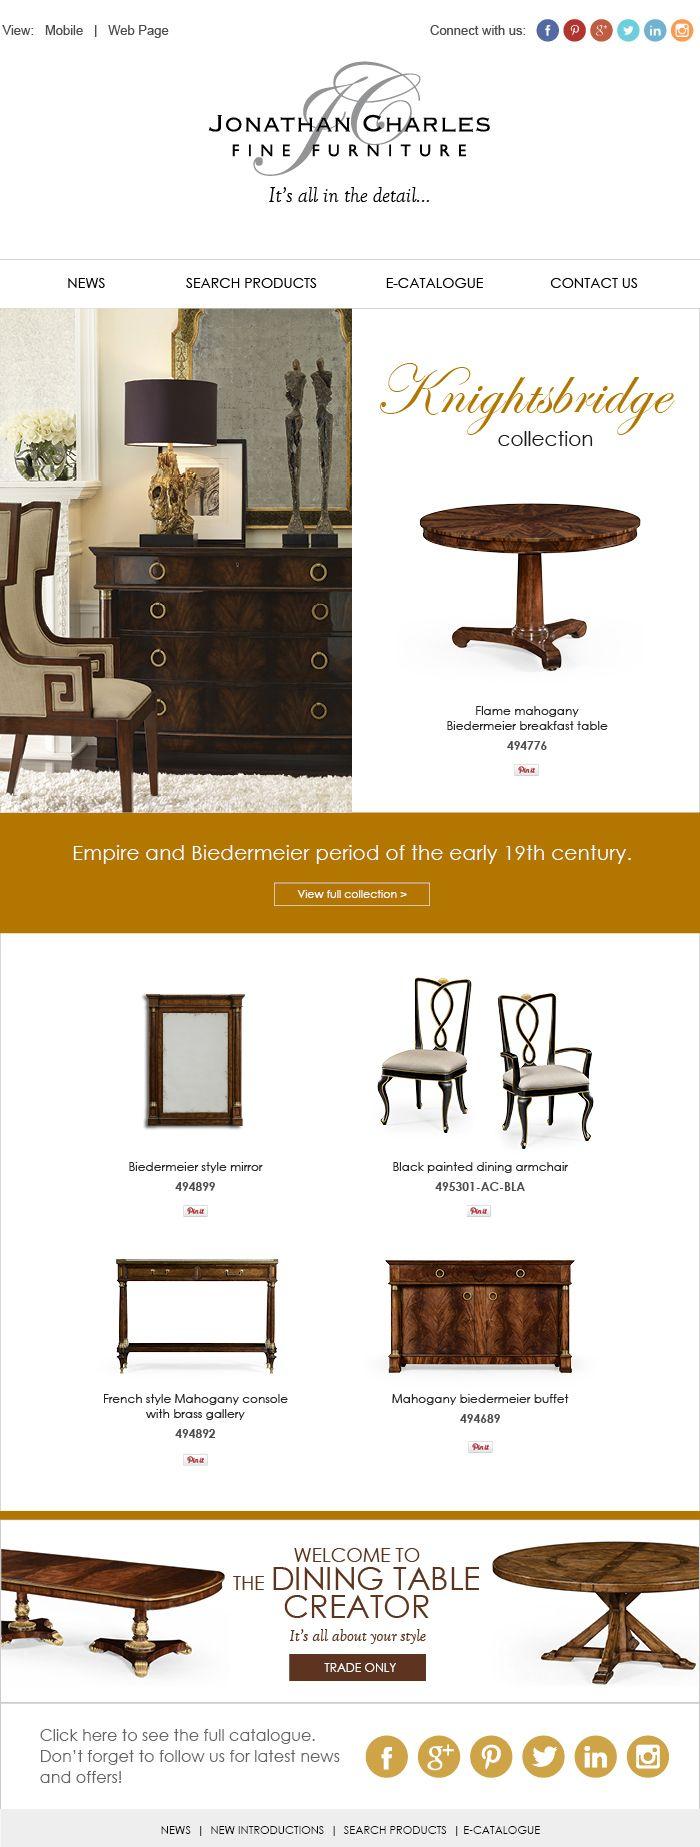 KNIGHTSBRIDGE COLLECTION Jonathancharles Furniture InteriorDesign Decorex Hpmkt Dining RoomsDining